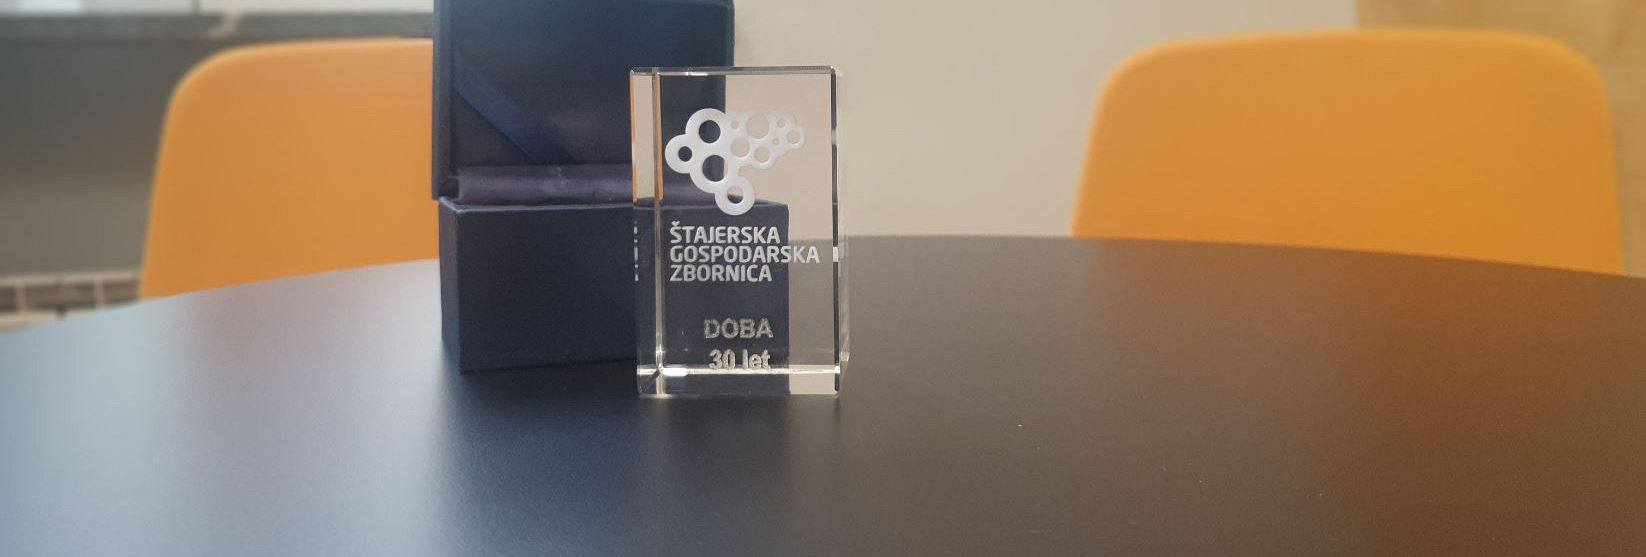 Nagrada Štajerske gospodarske zbornice DOBI ob 30. obletnici